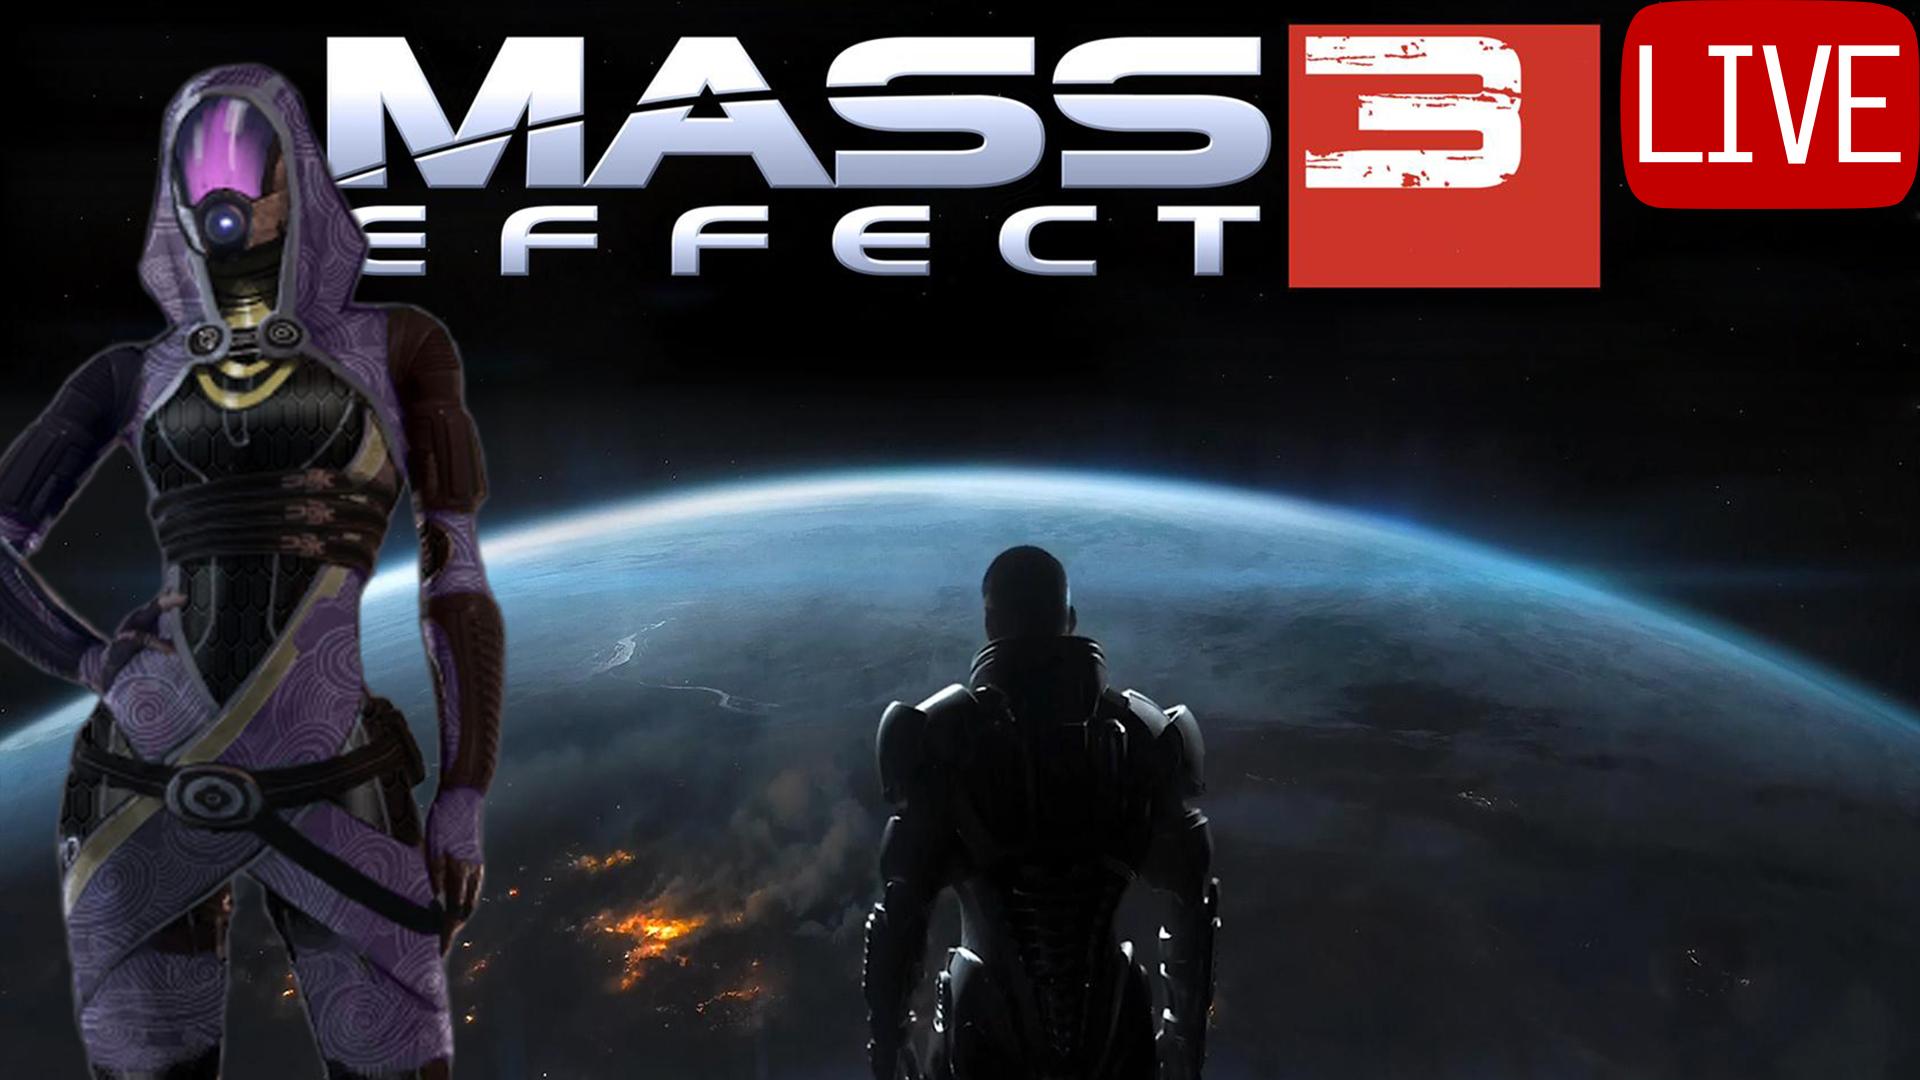 Mass Effect 3 Thumbnail Live Tali